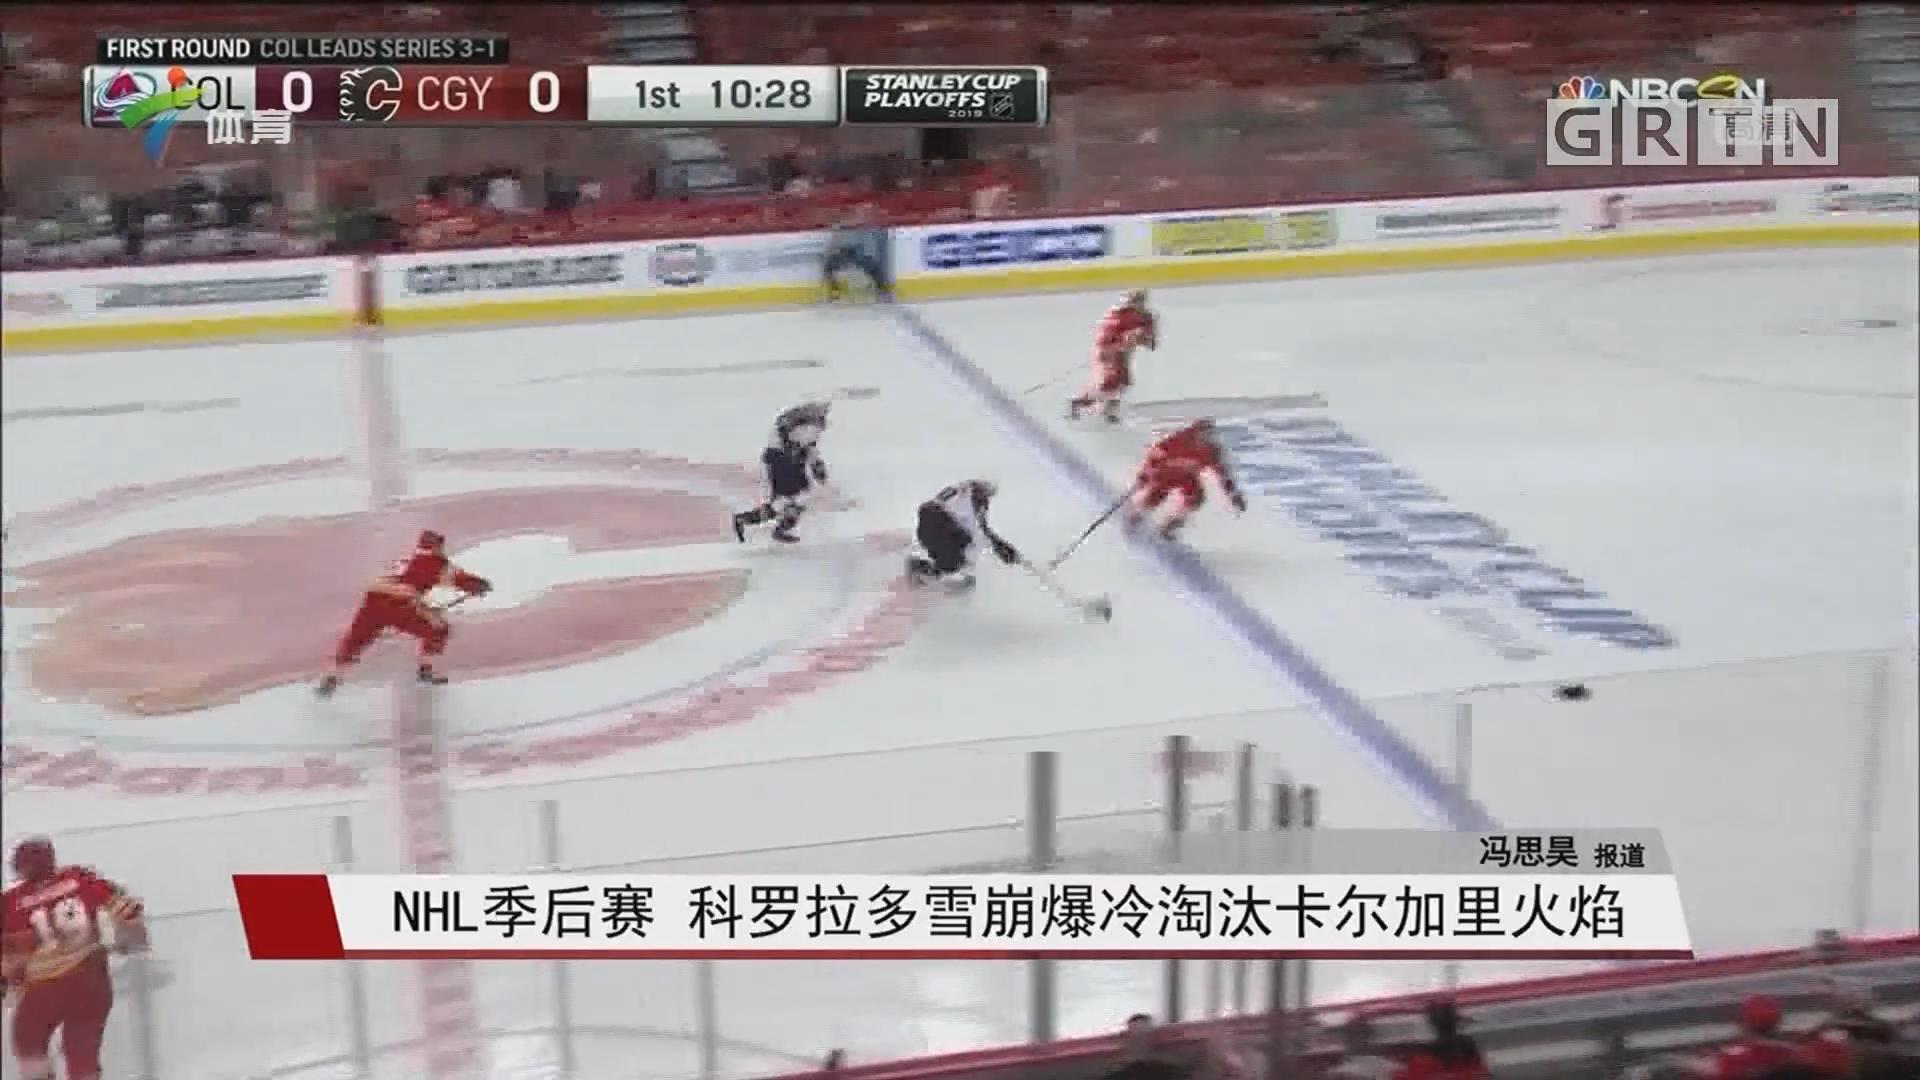 NHL季后赛 科罗拉多雪崩爆冷淘汰卡尔加里火焰